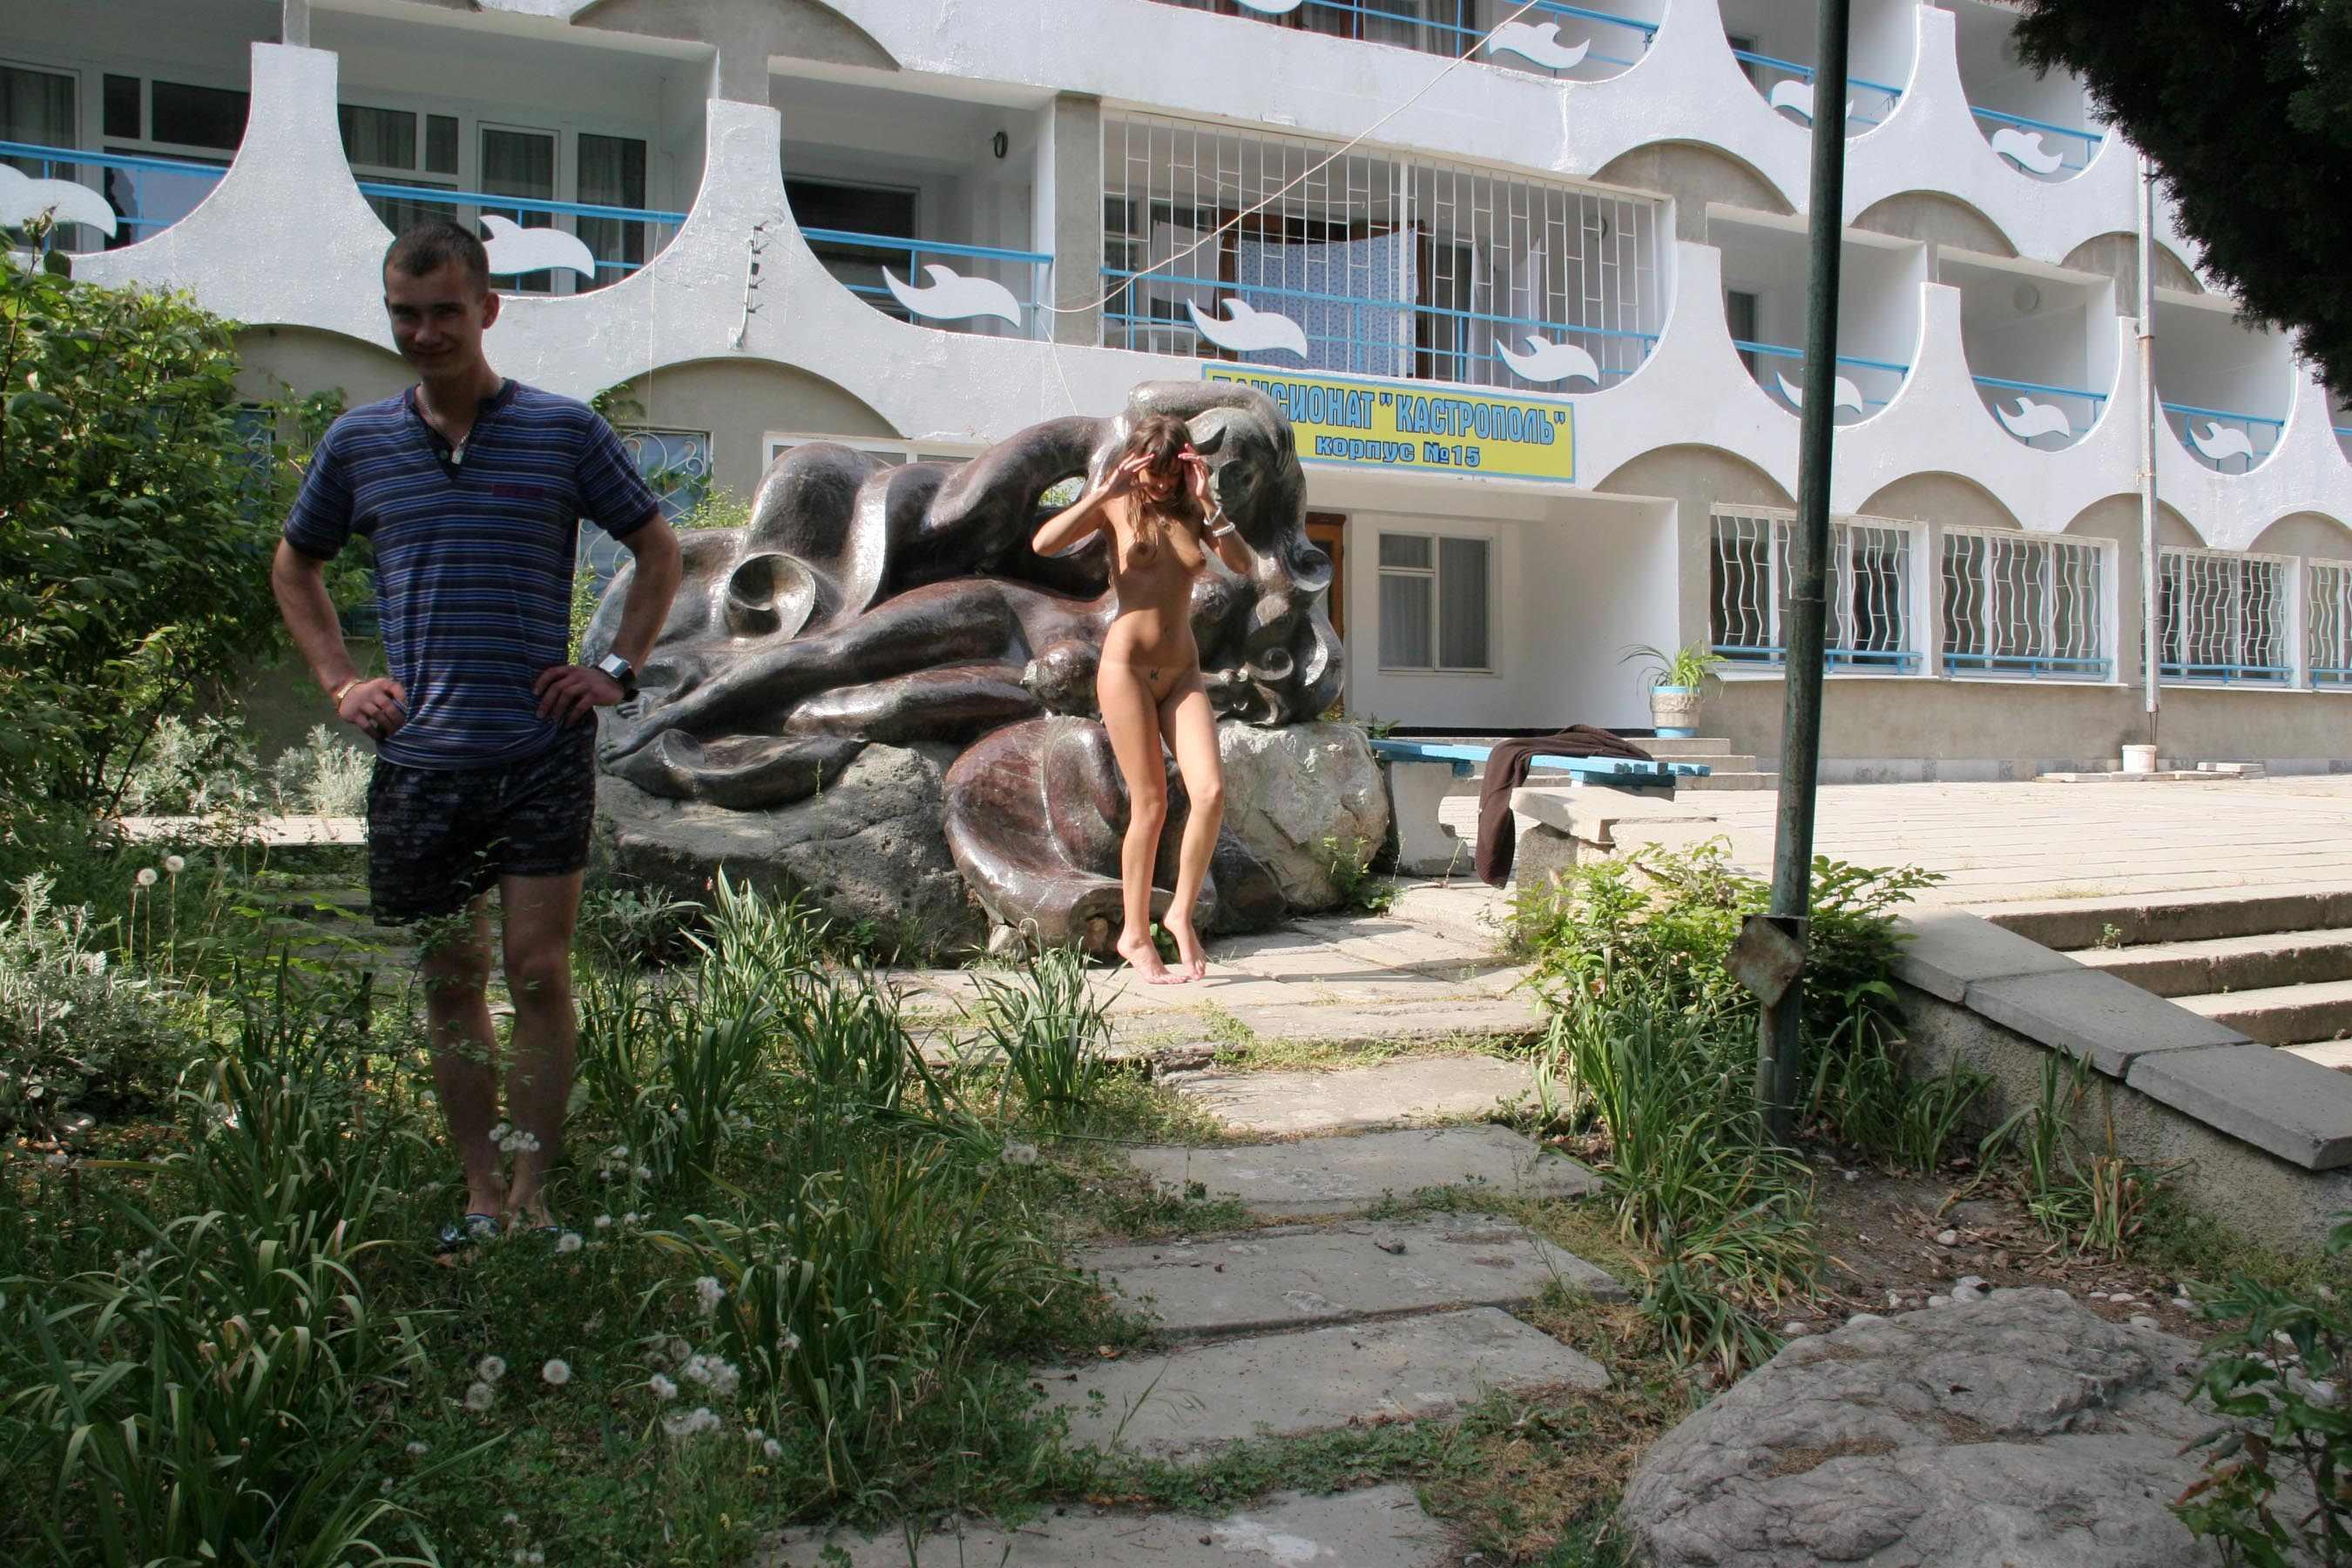 melena-crimean-holiday-public-nude-in-russia-25